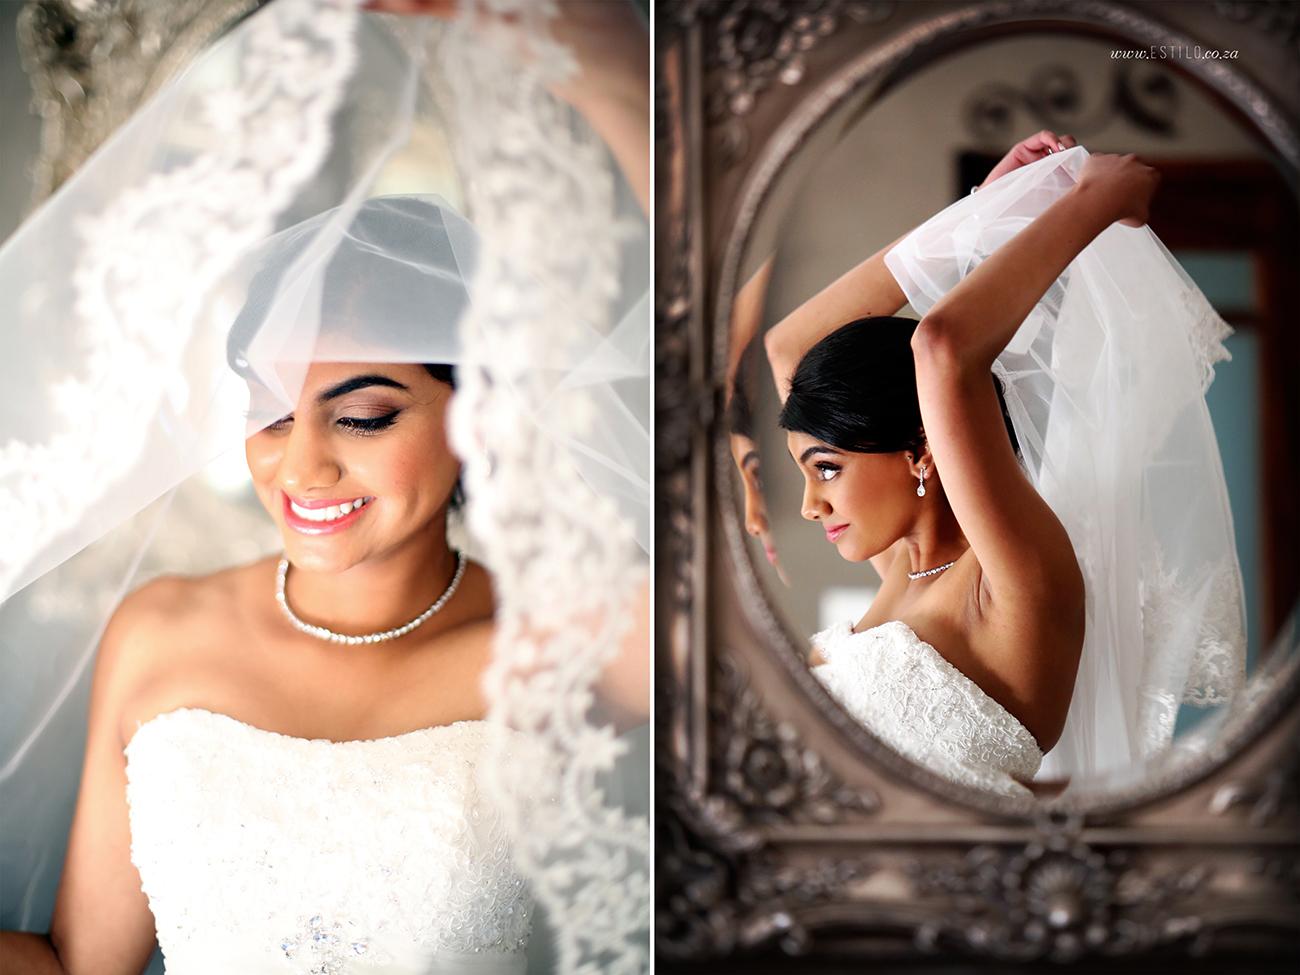 memoire-wedding-photograpgers-weddings-at-memoire-muldersdrift-best-wedding-photographers-gauteng-best-wedding-photographers-south-africa_0010.jpg